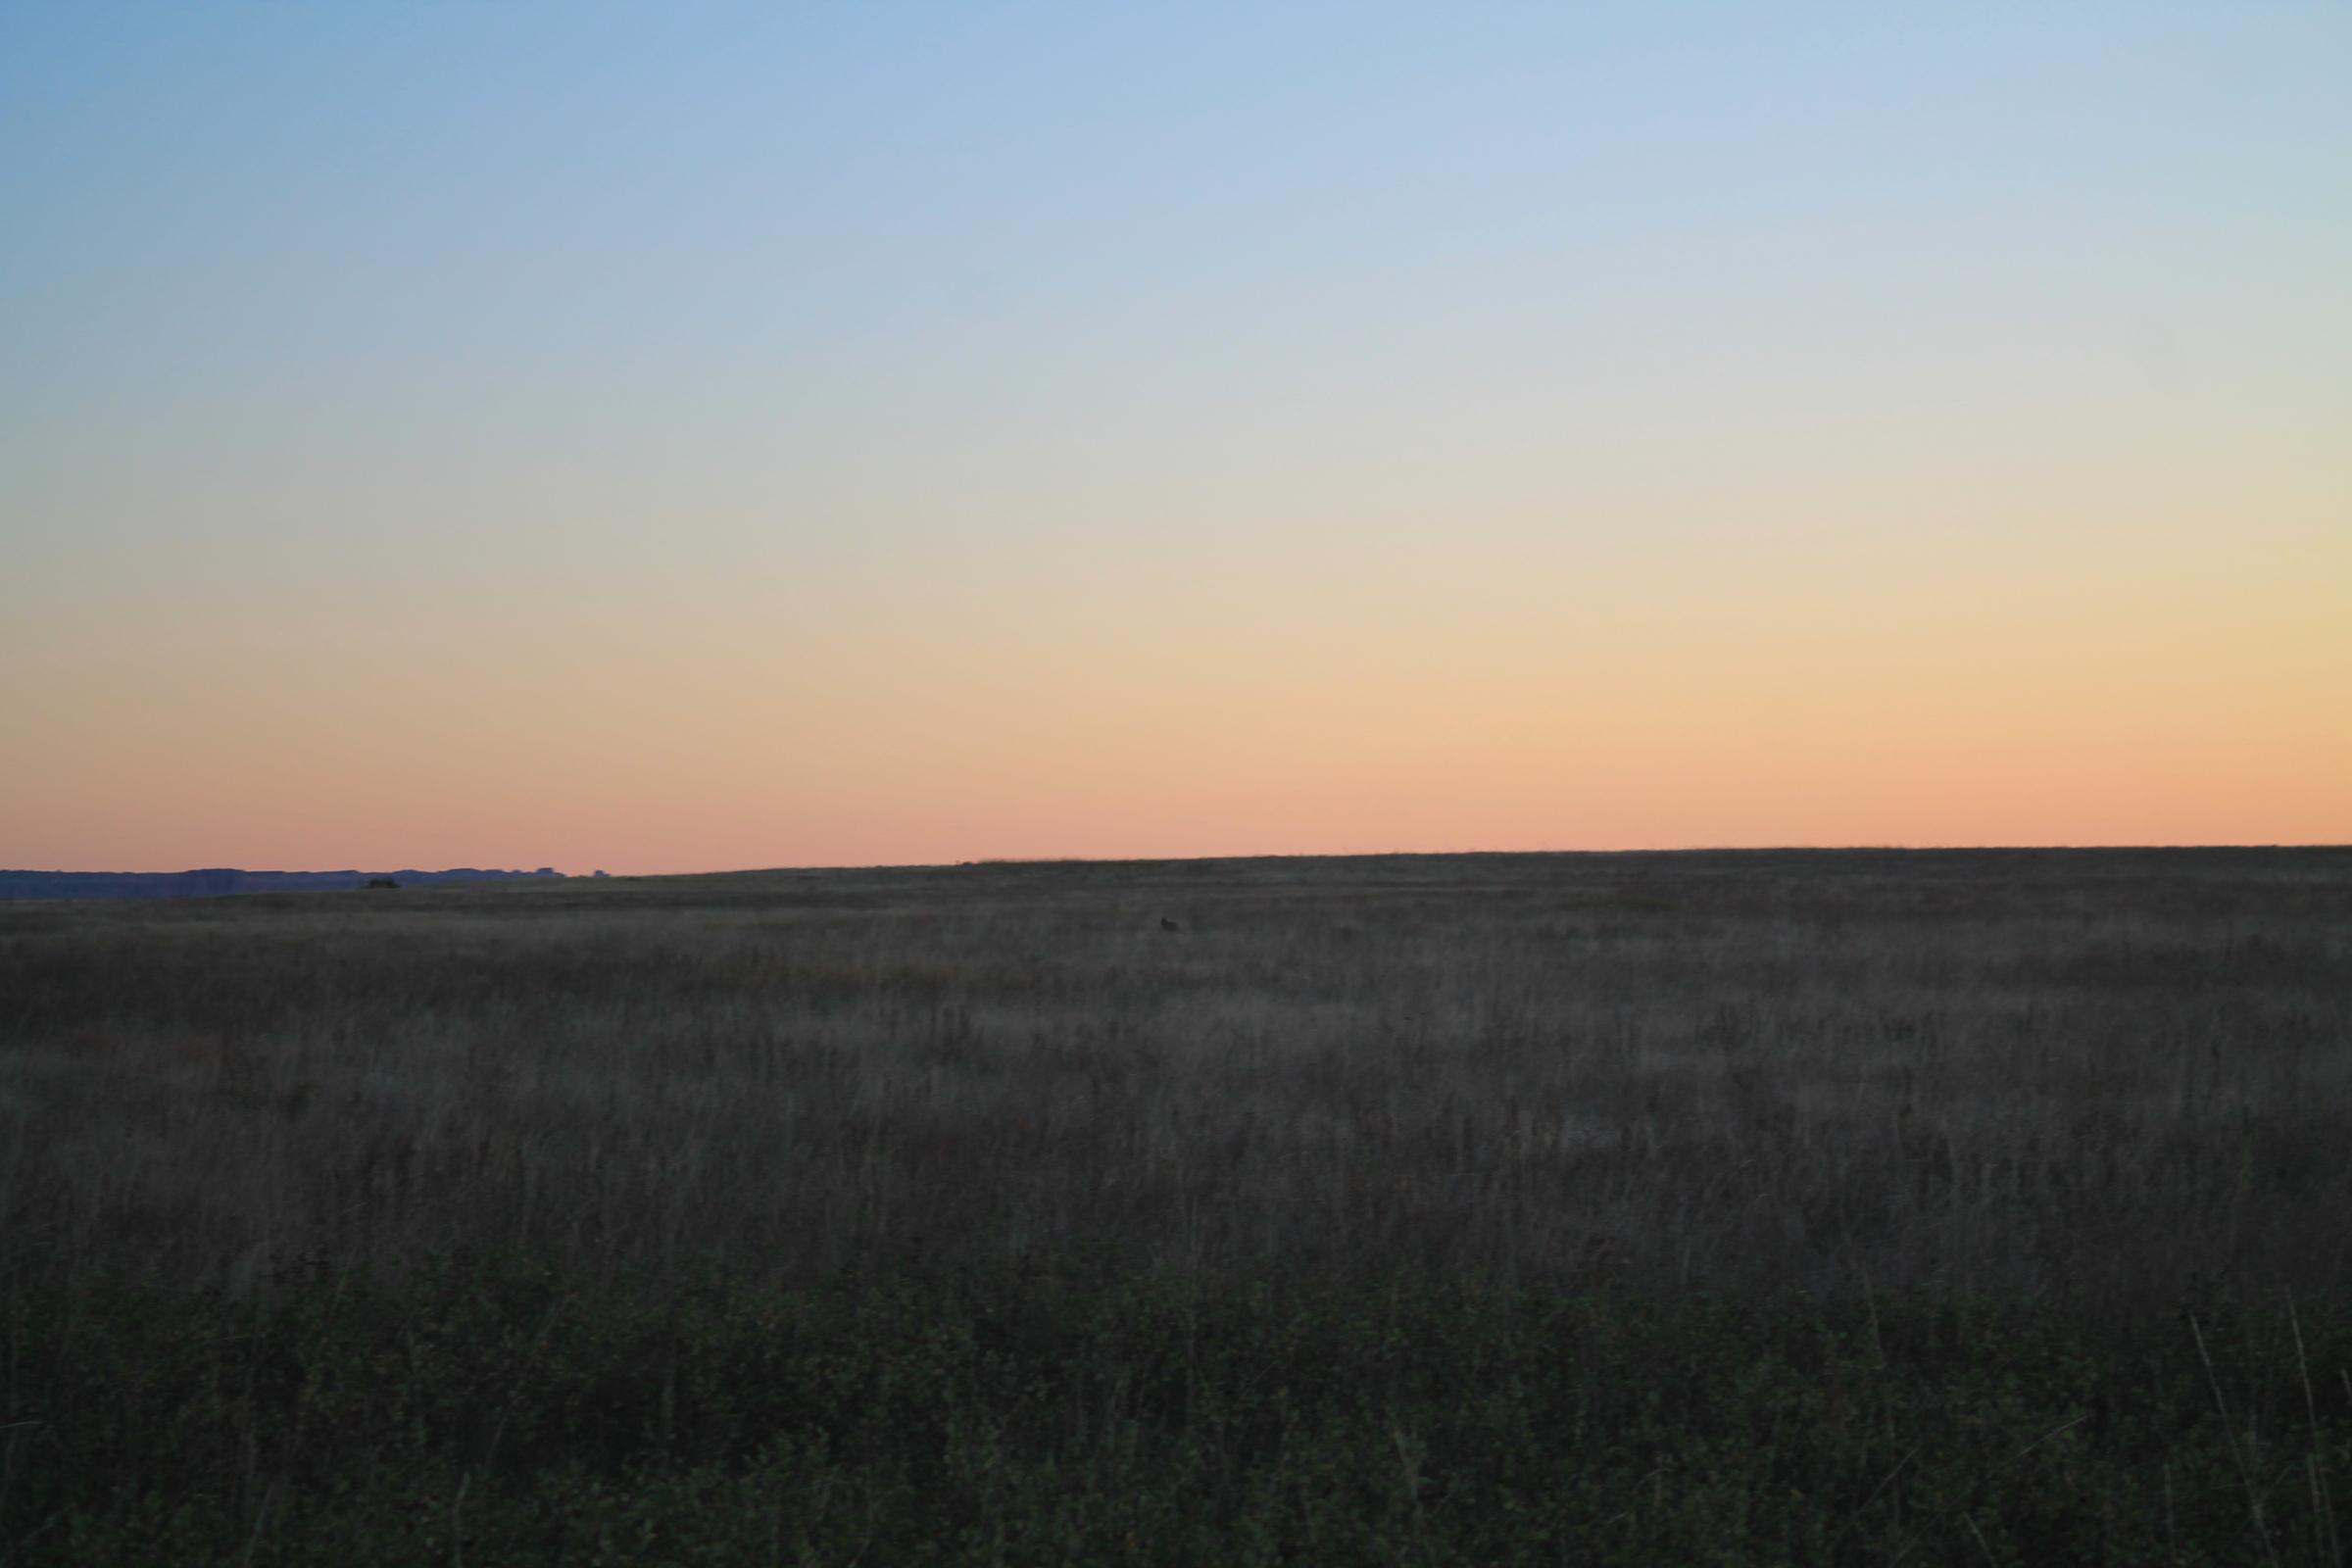 A coyote crosses the prairie at dawn.